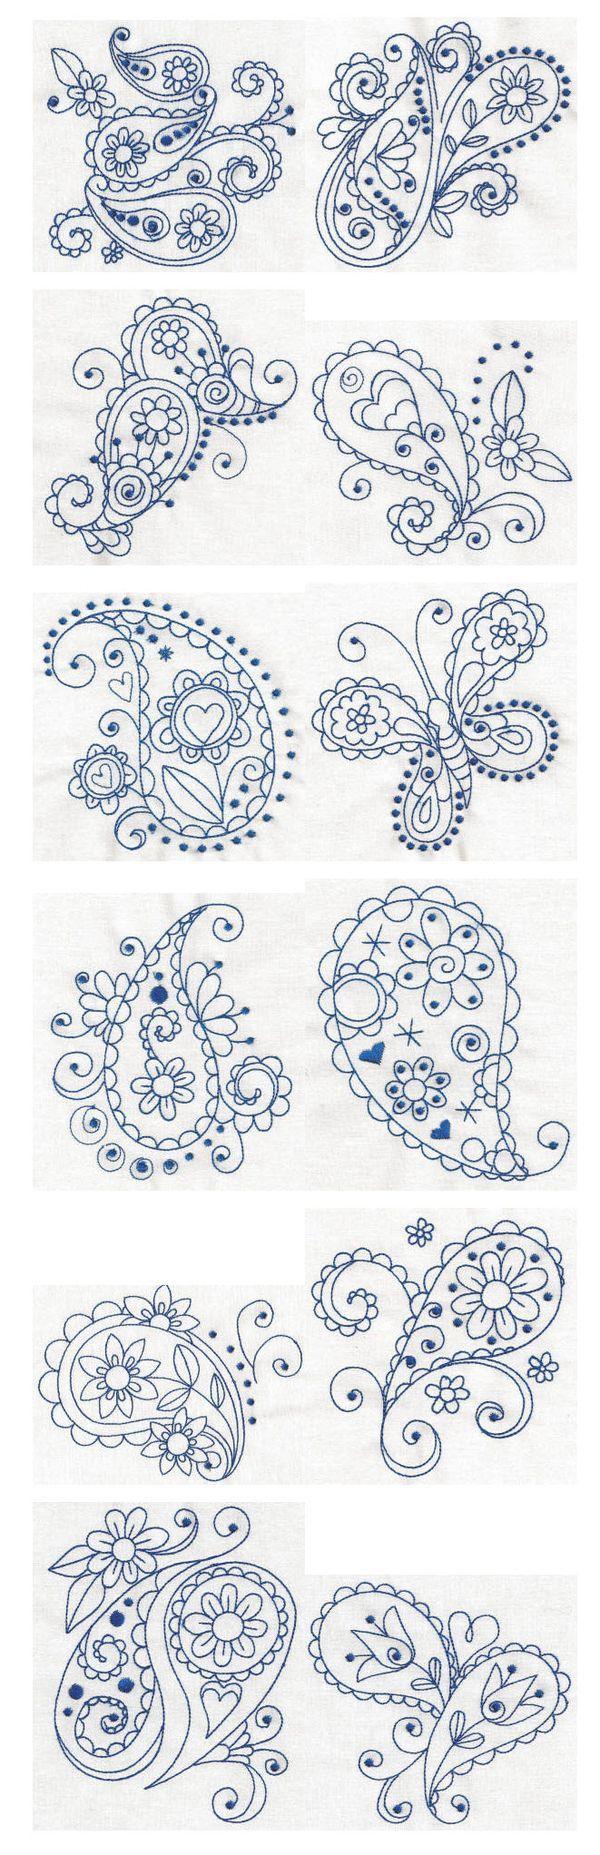 Pin de Jocelyn Calvillo en Henna✌   Pinterest   Mandalas, Bordado ...